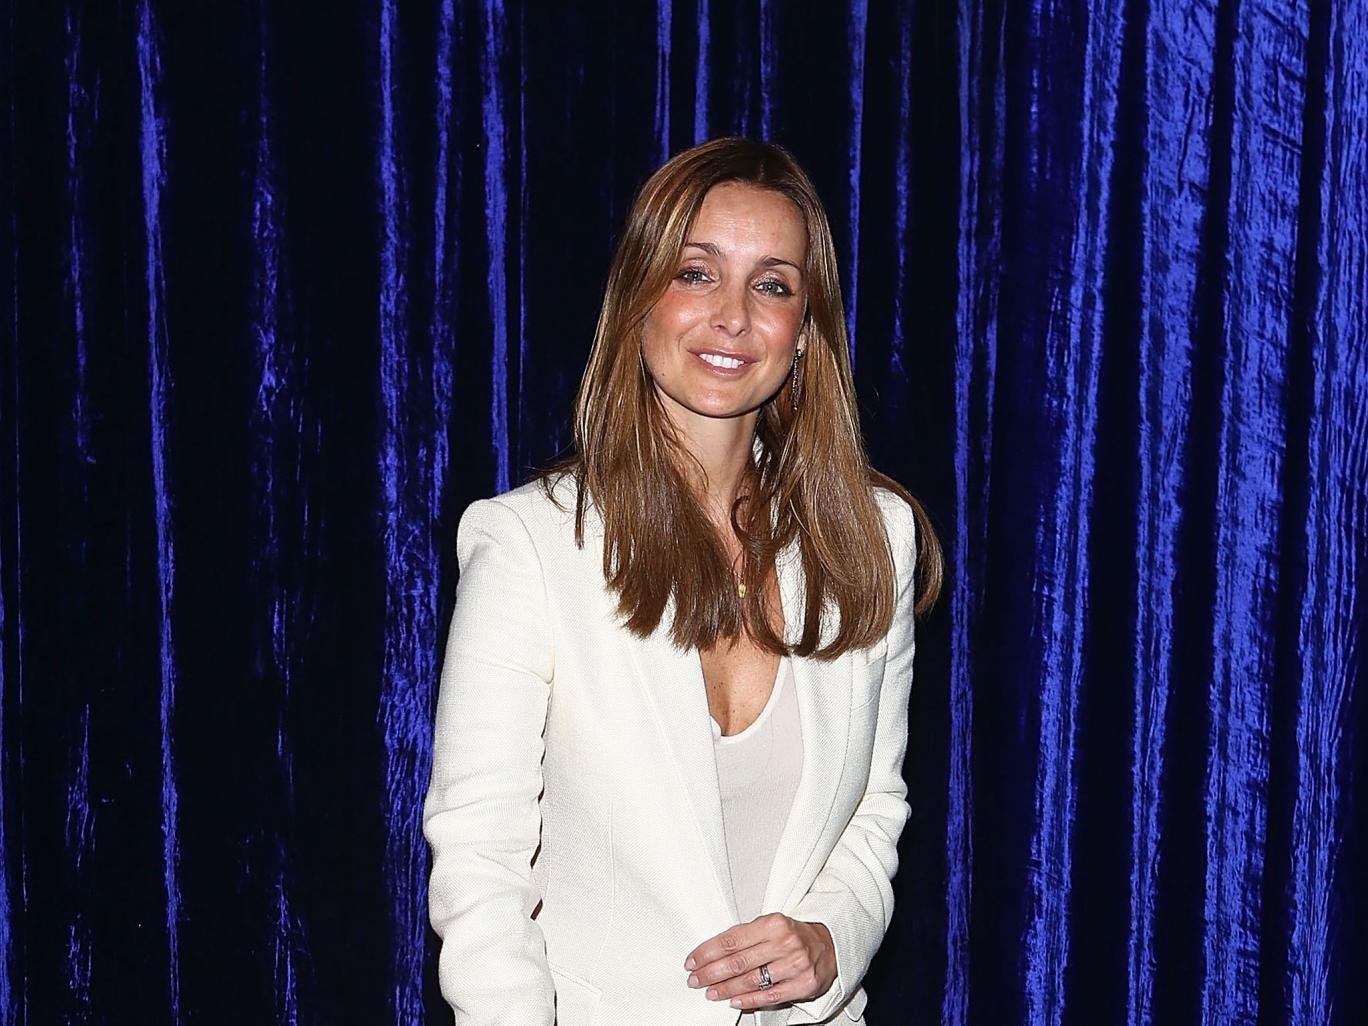 Louise Redknapp is married to retired footballer Jamie Redknapp